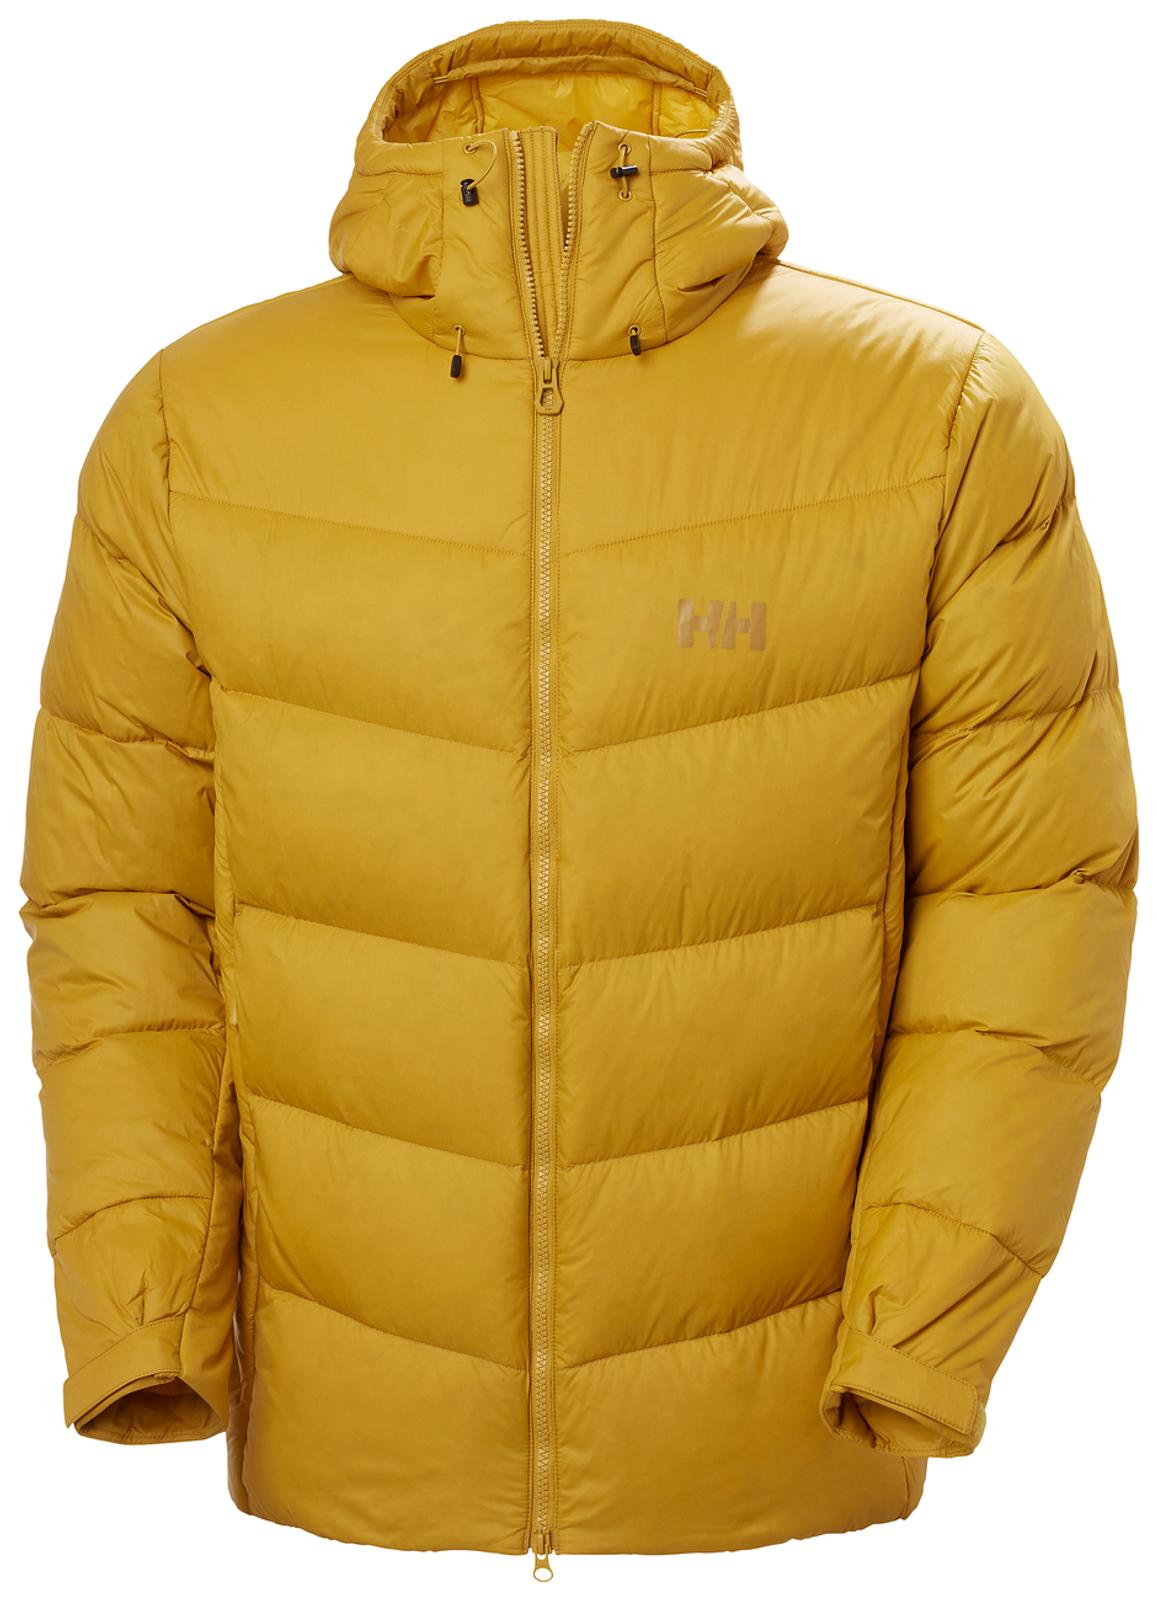 Helly Hansen Verglas Icefall Down Jacket, Mens - Arrowwood | 63002